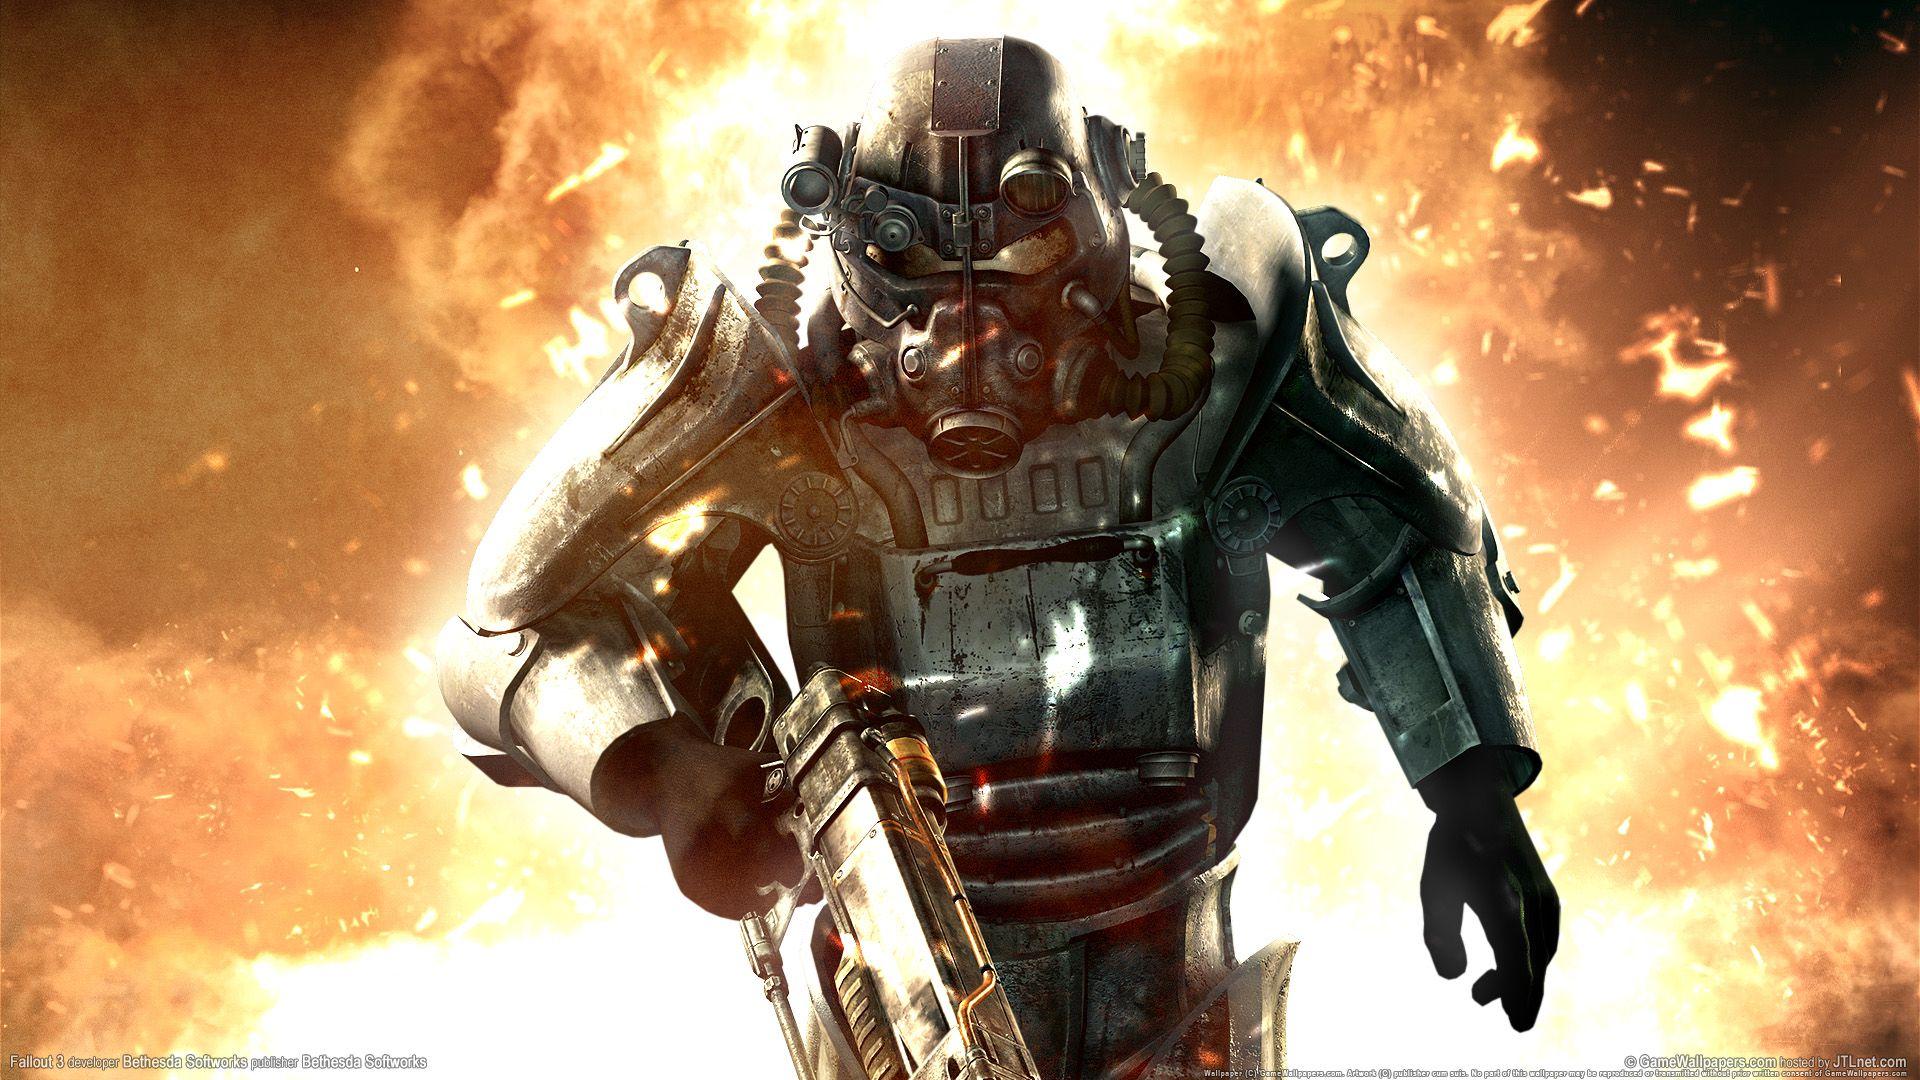 Fallout 3 Fallout Wallpaper Fallout 3 Wallpaper Fallout